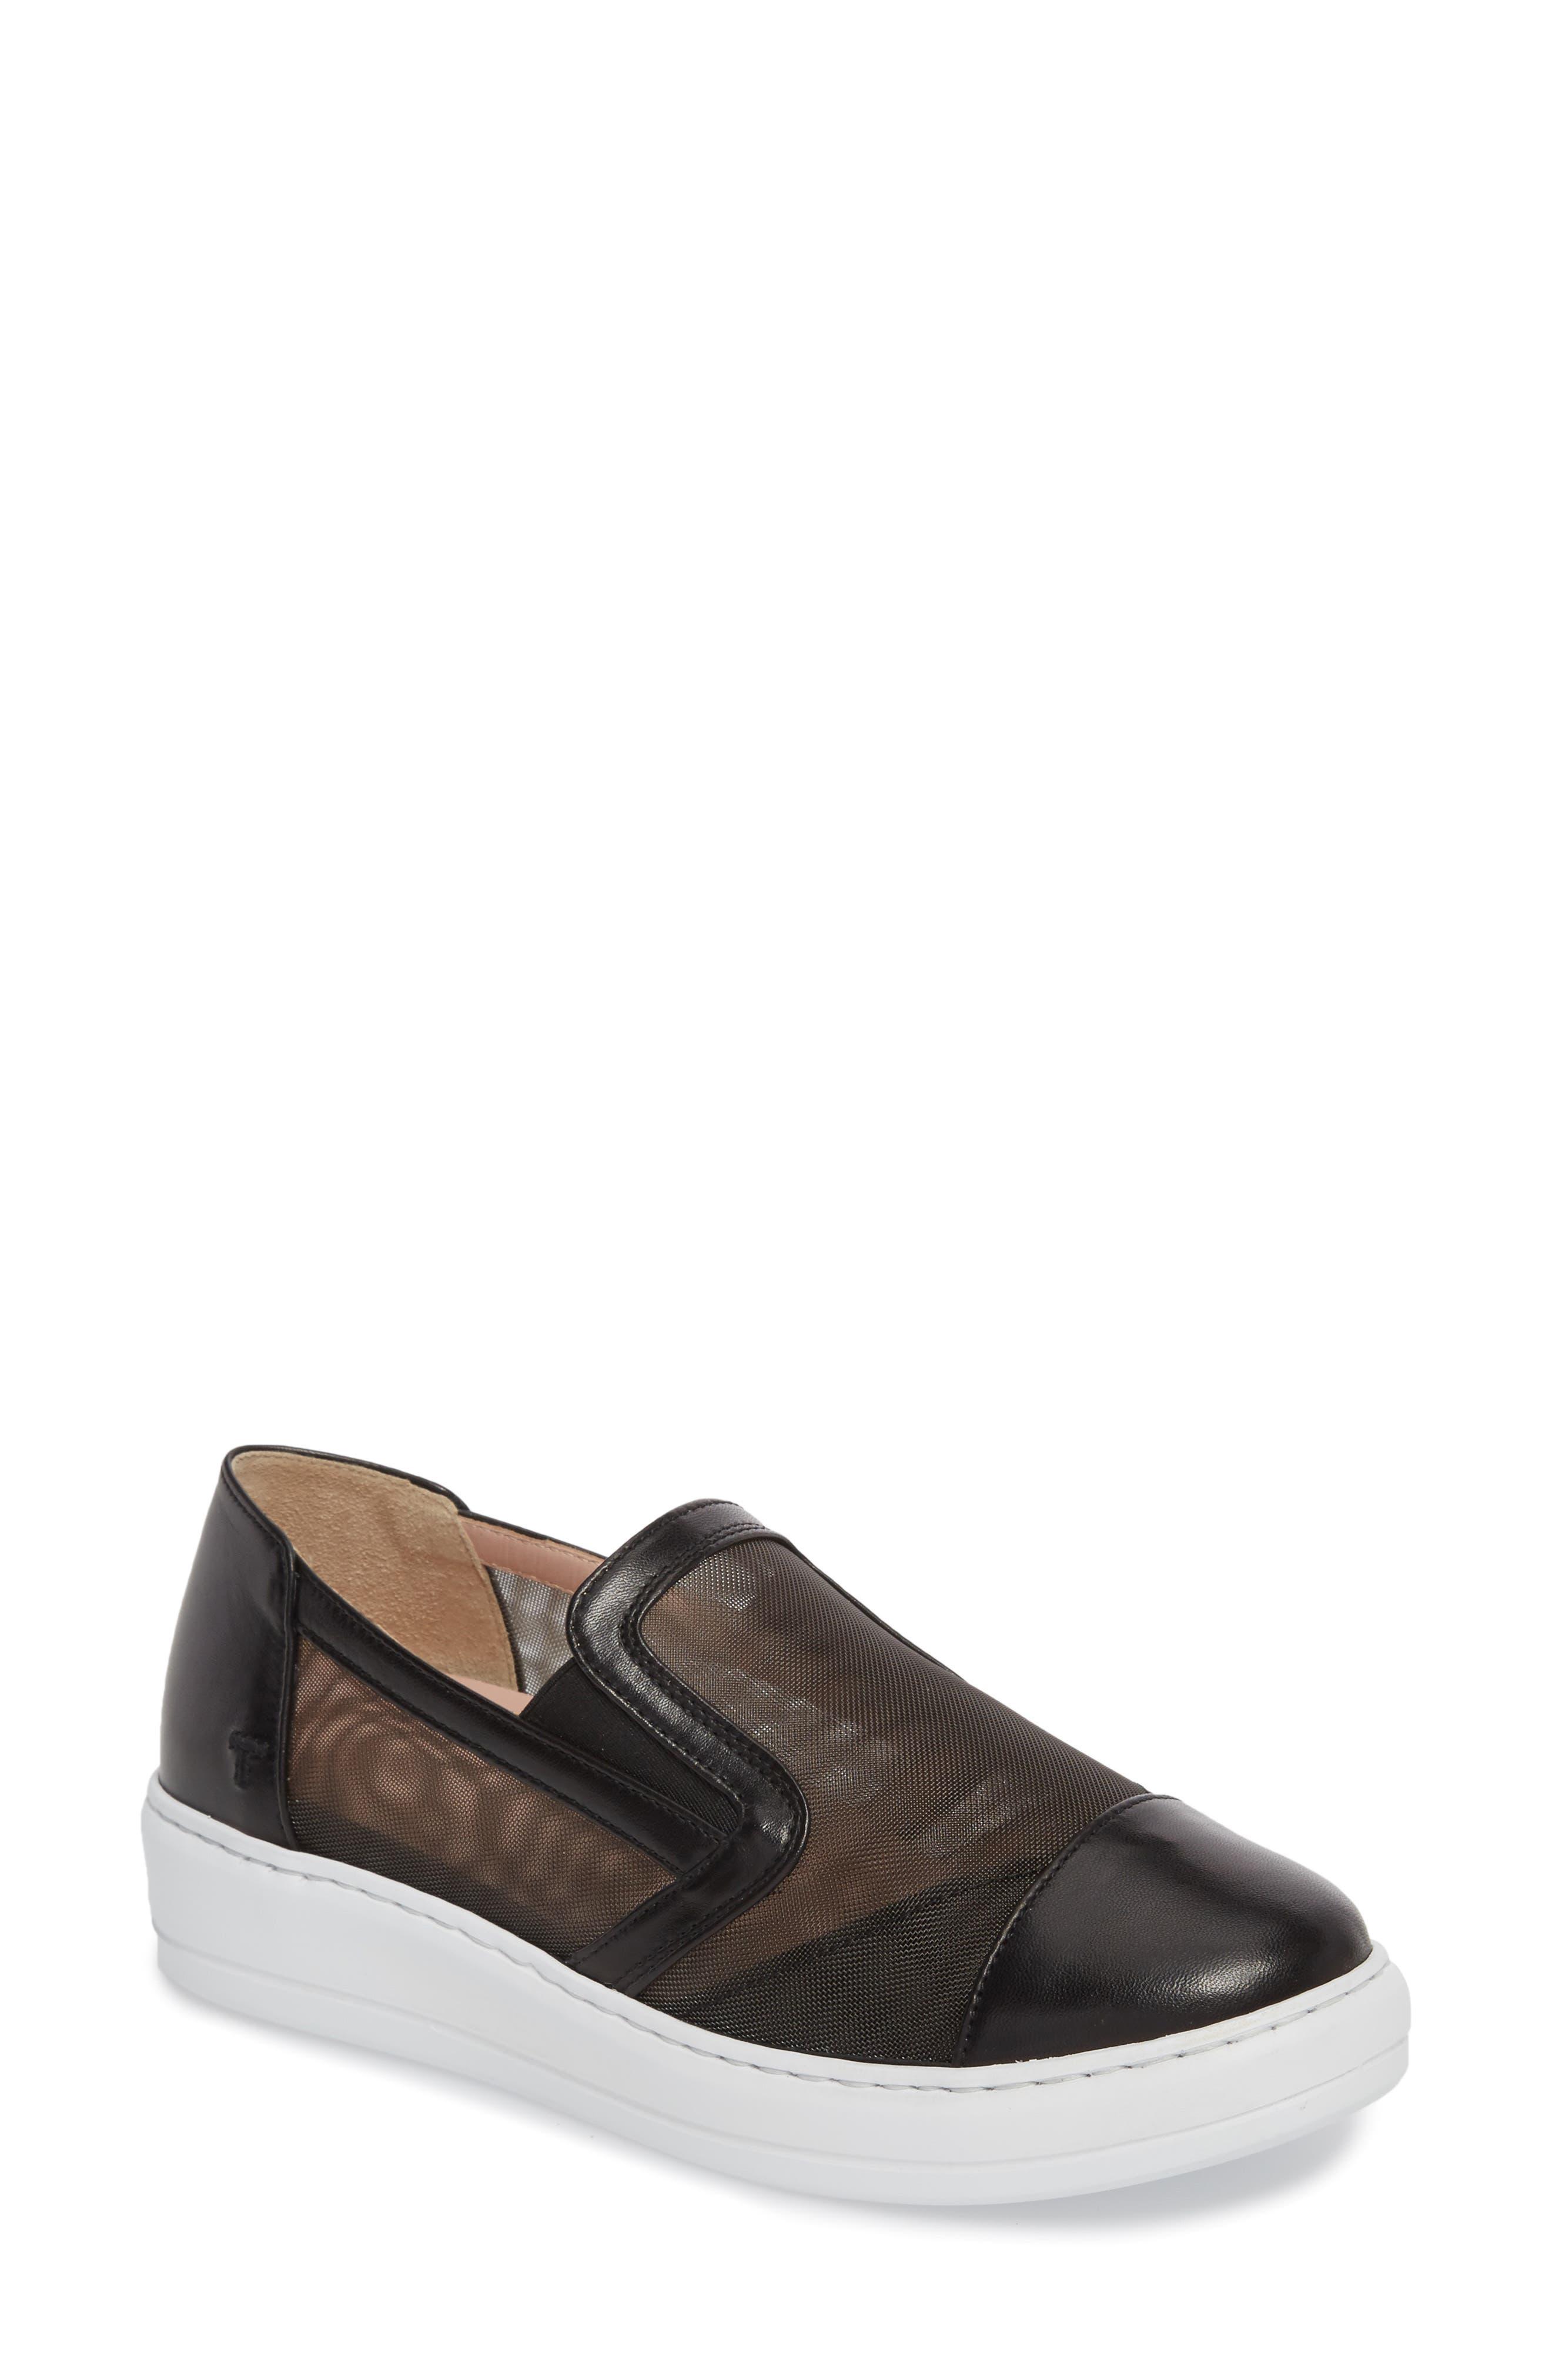 Taryn Rose Calandra Slip-On Sneaker,                             Main thumbnail 1, color,                             004